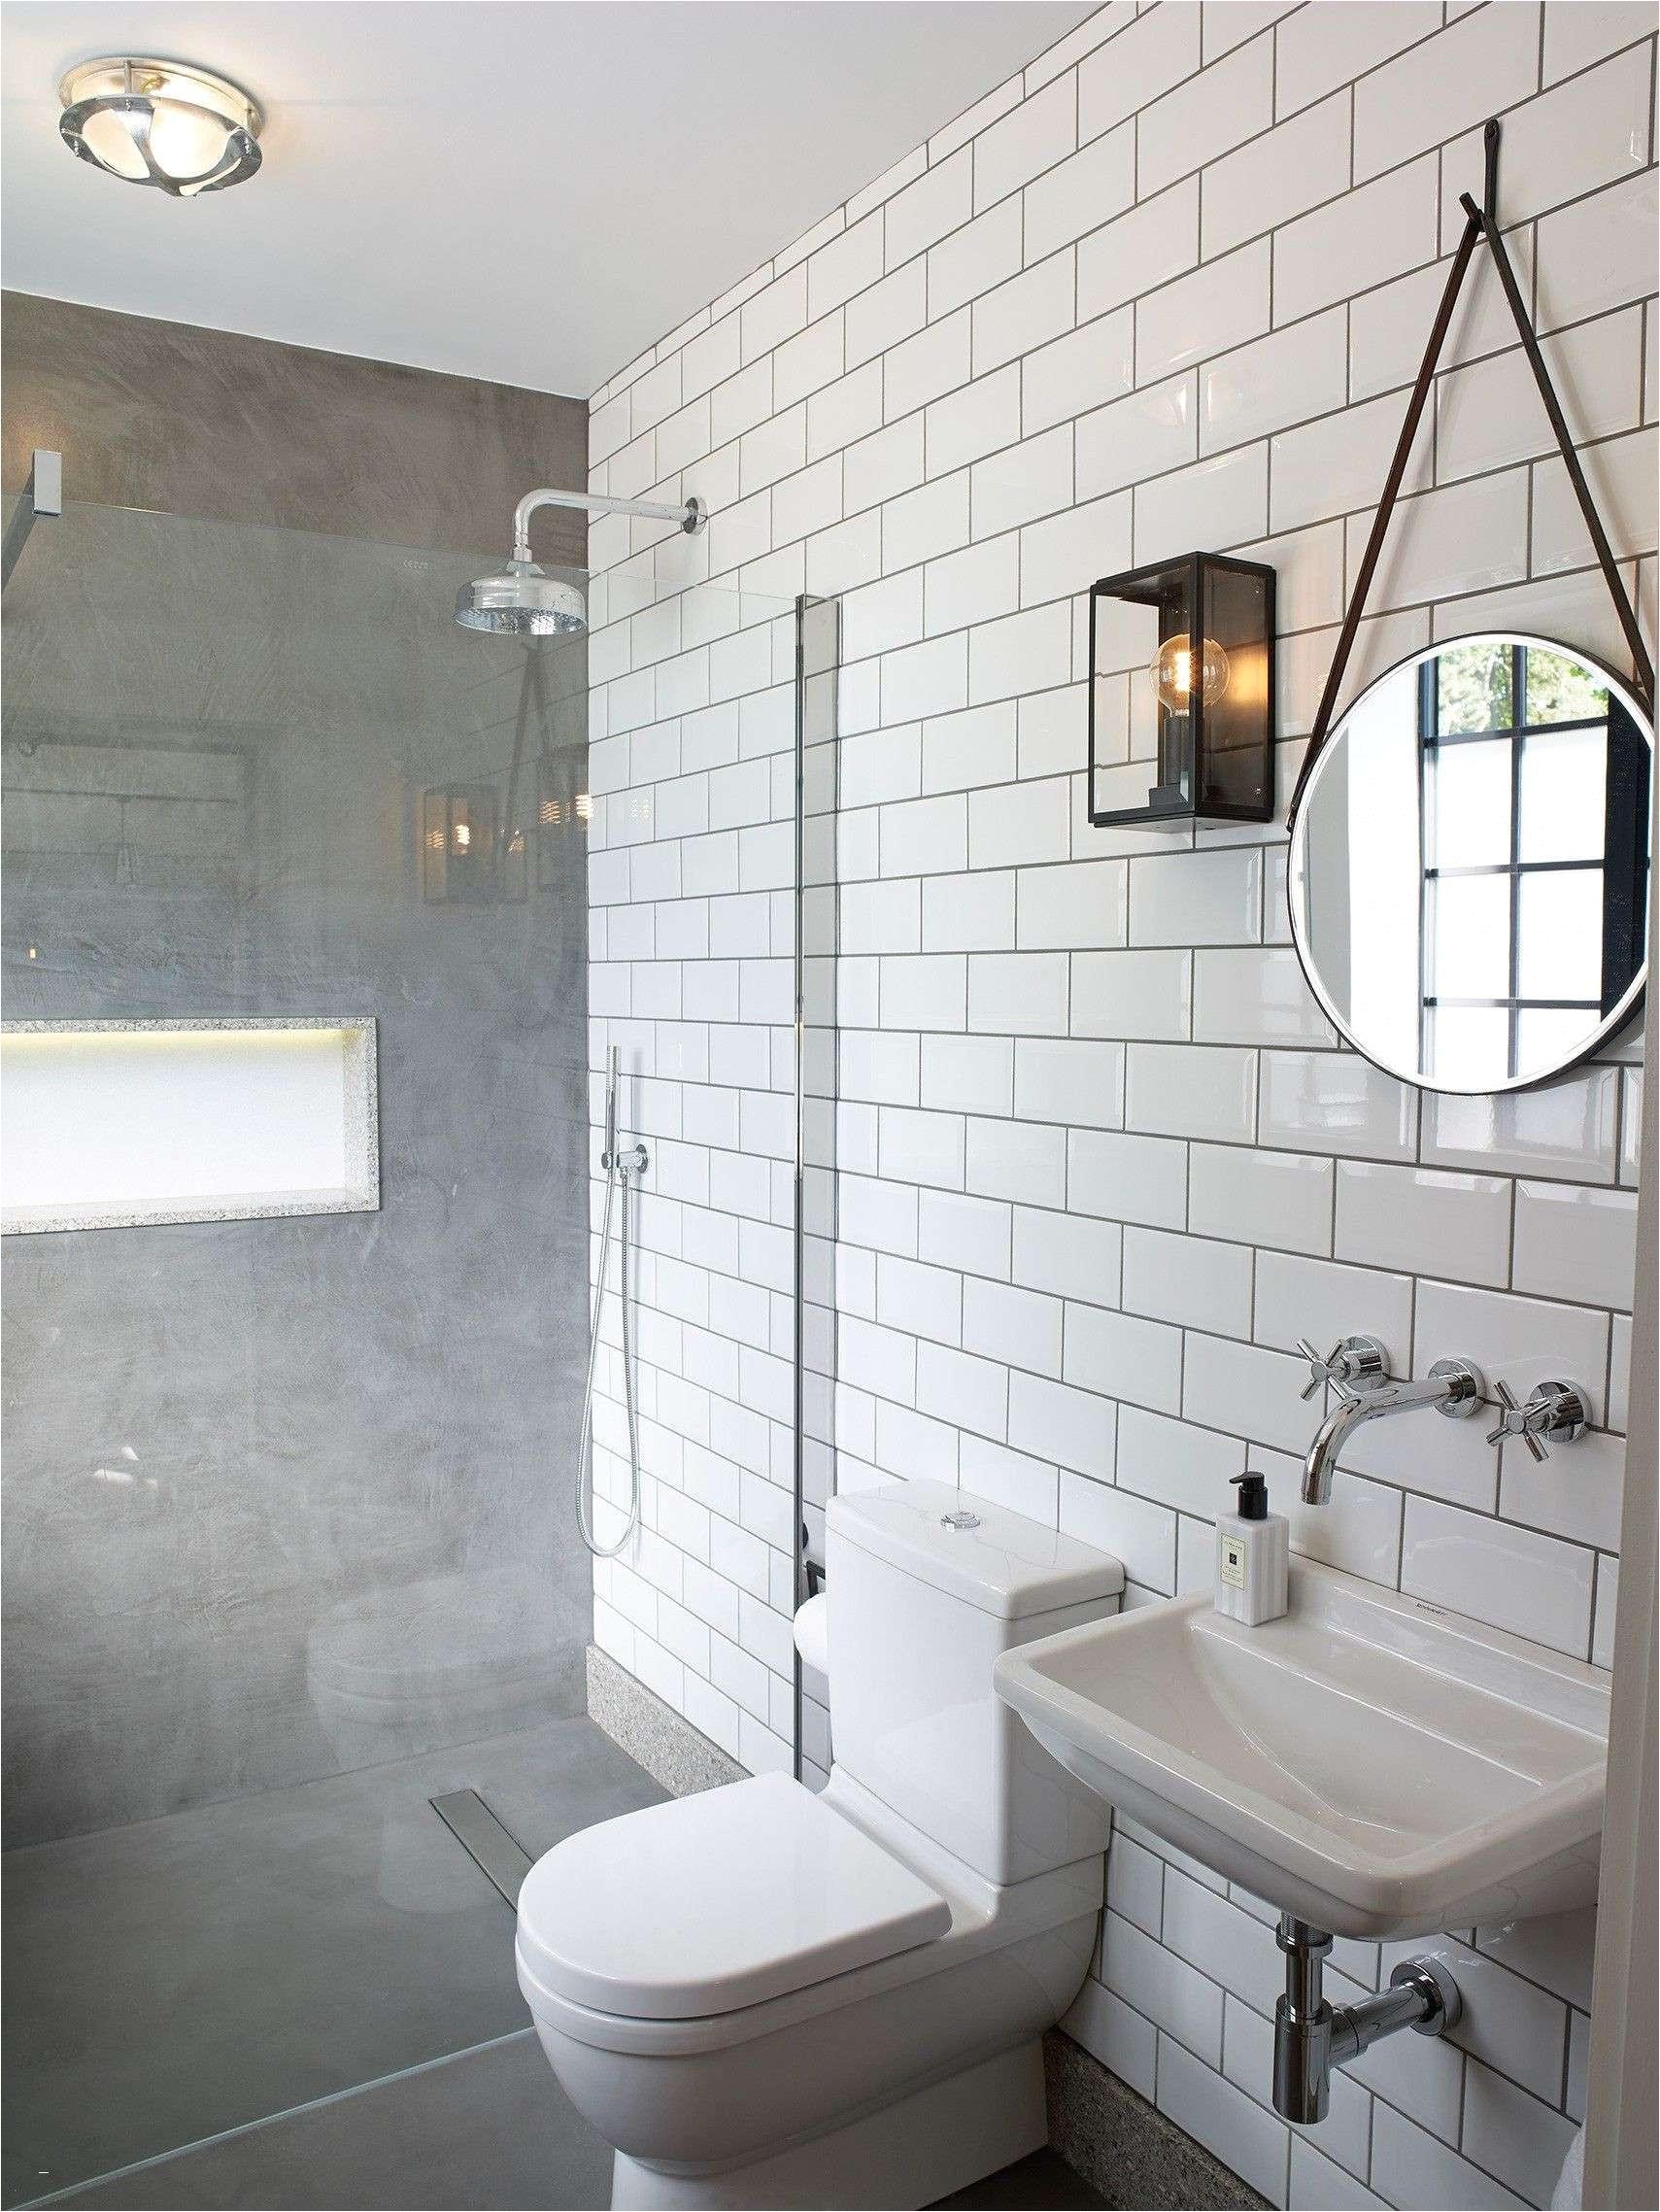 bathroom wall decor ideas incredible tag toilet ideas 0d mucsat design ideas toilet paper wall